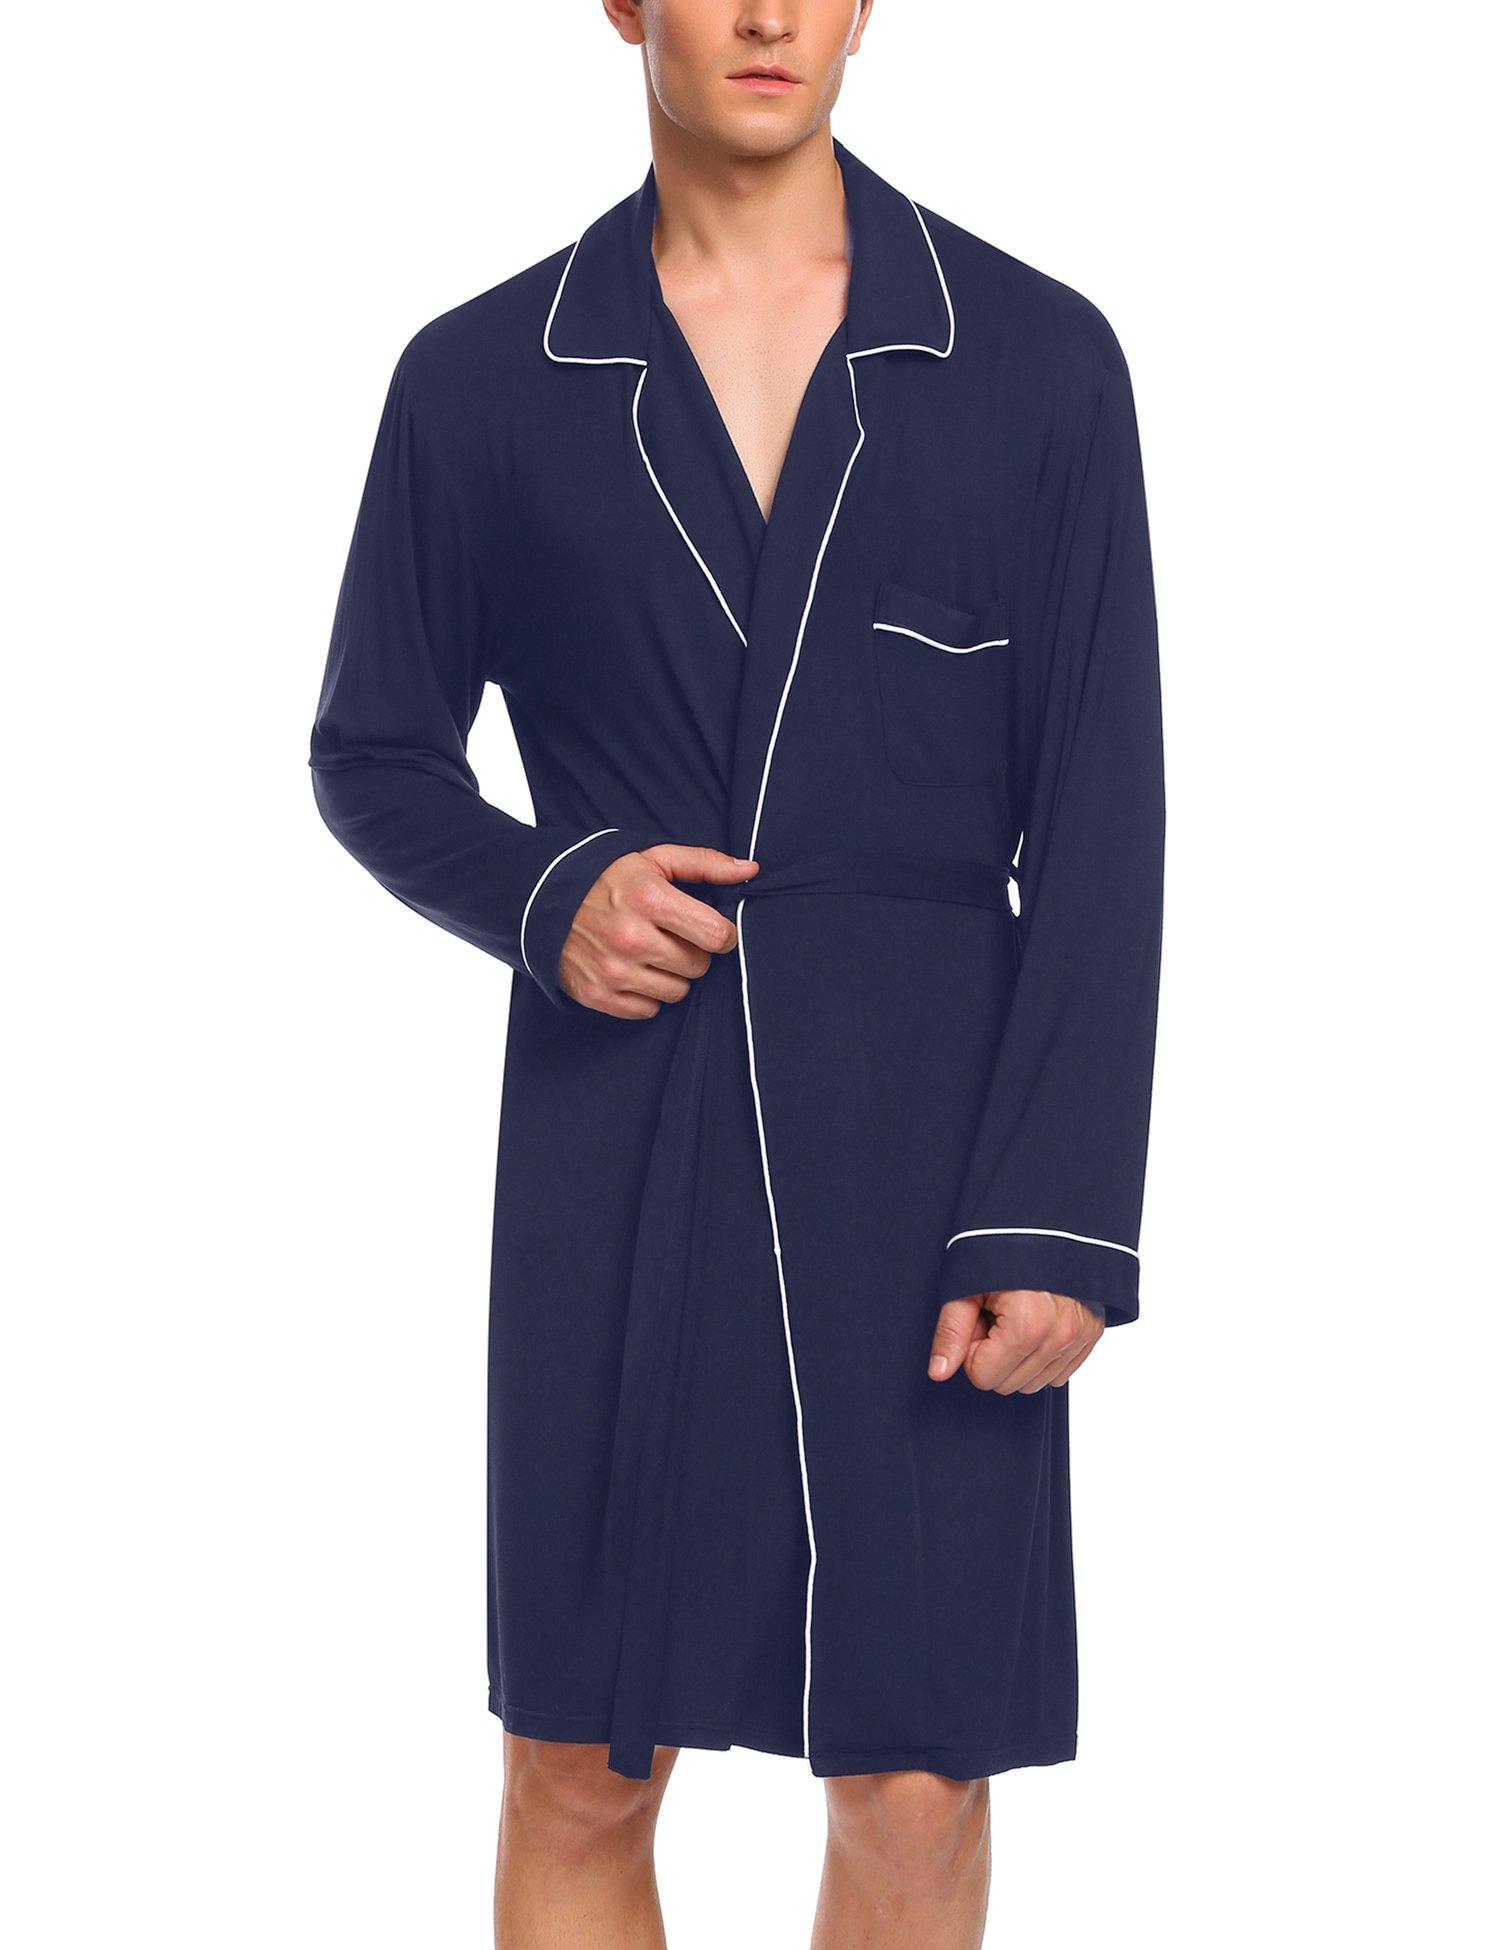 Ekouaer Mens Robes Long Sleeve Cotton Nightware, 7987-navy Blue, Large